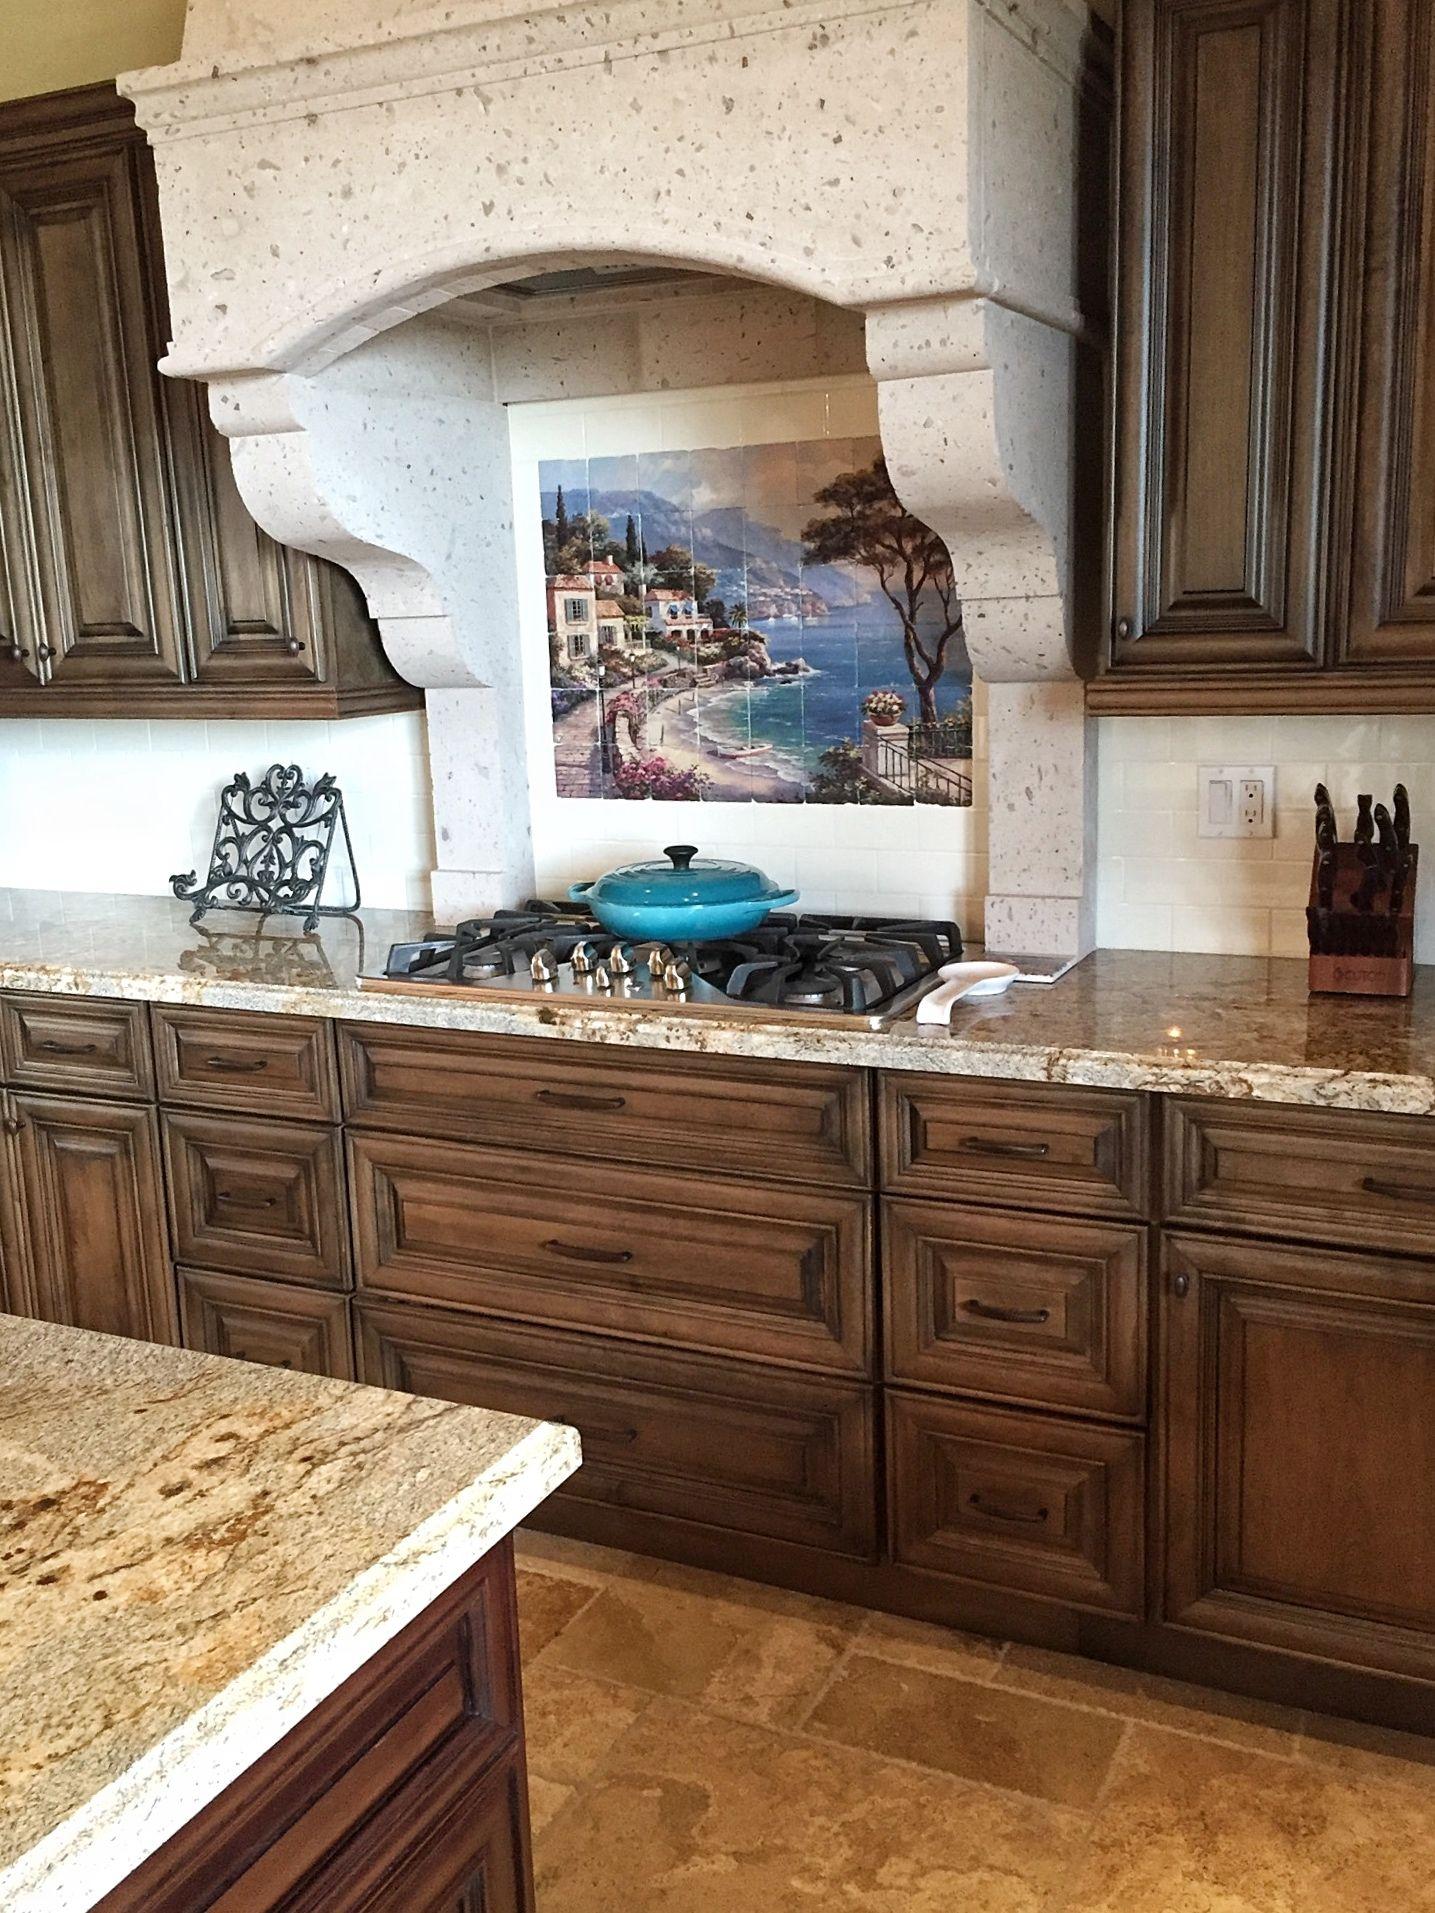 Home Granite Countertops Kitchen Kitchen Design Showrooms Traditional Kitchen Design